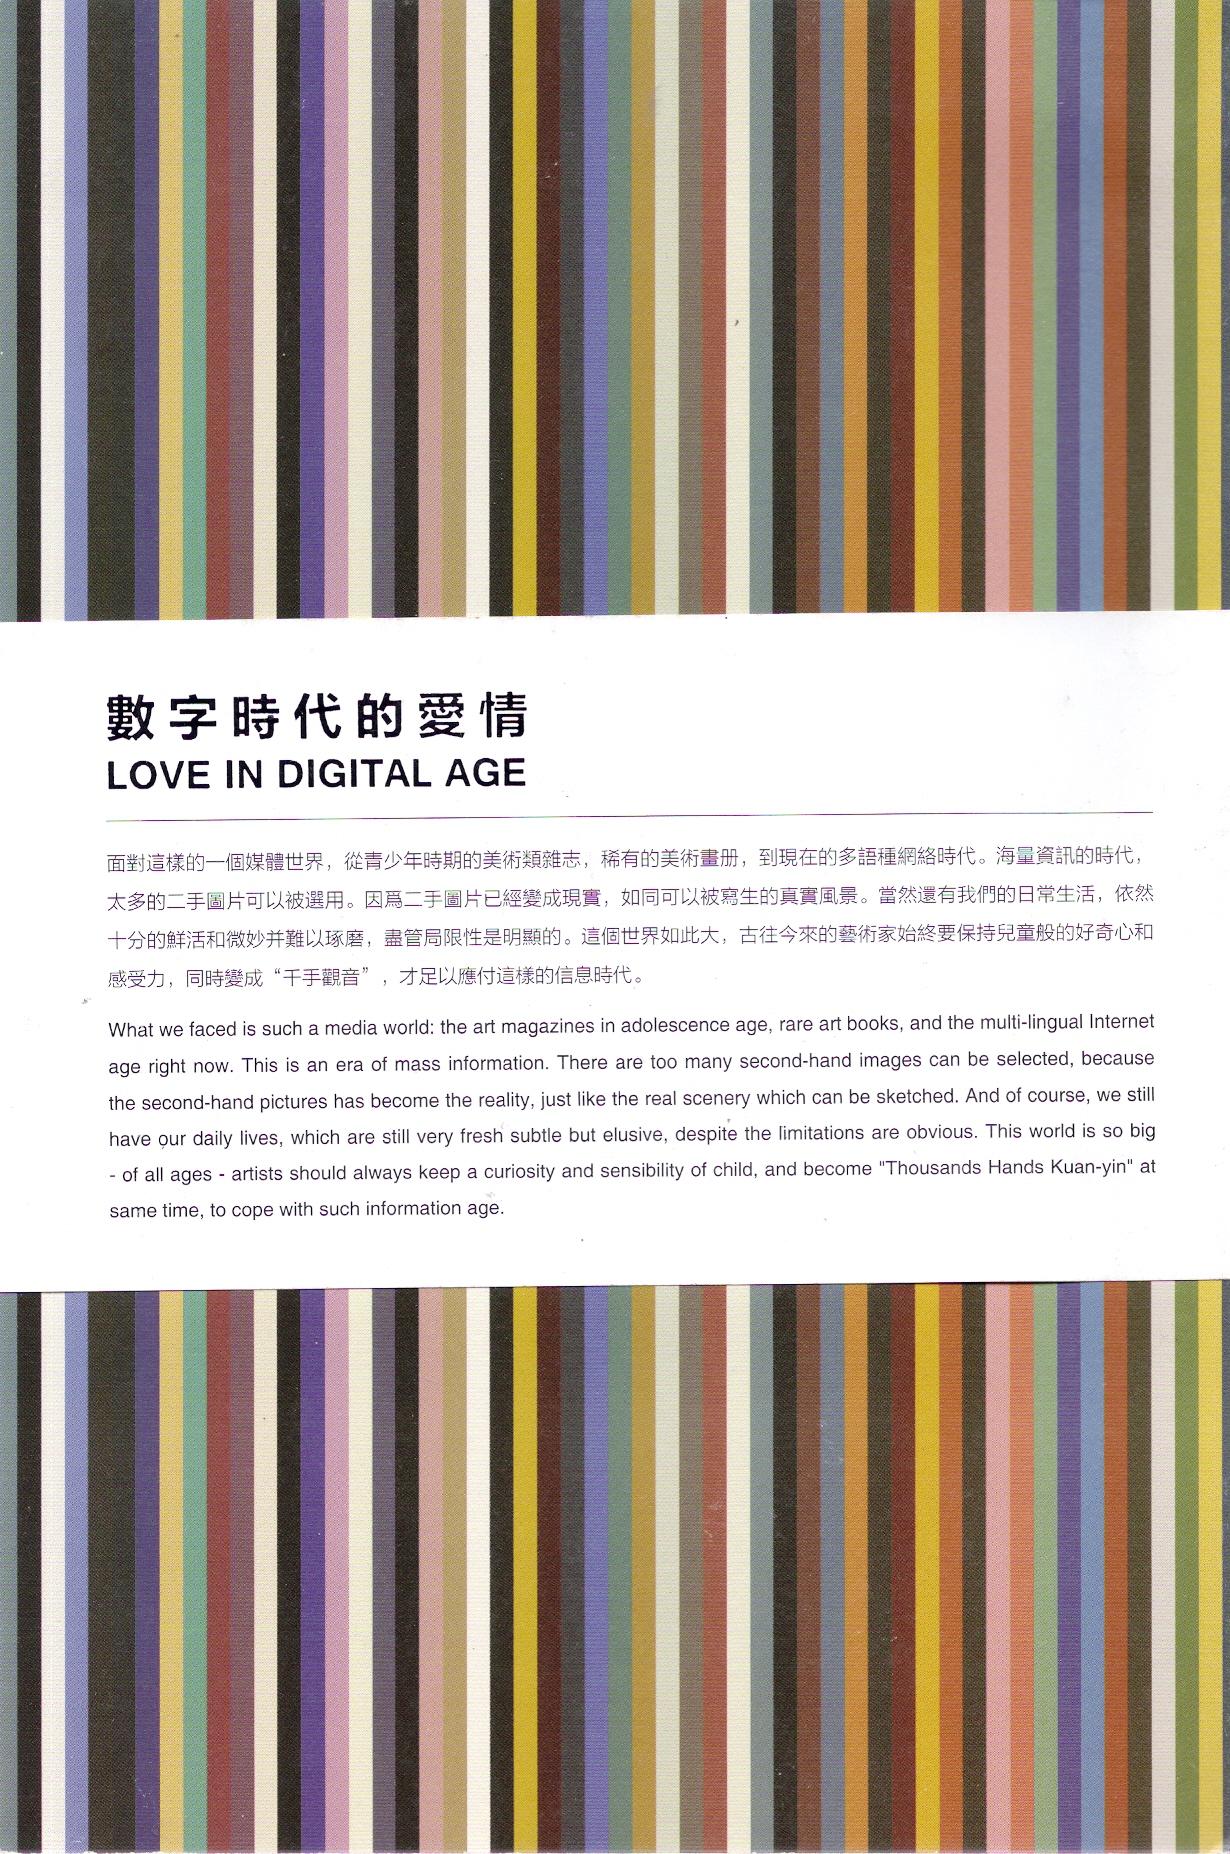 Sheng Tianhong Love in Digital Age , Aye Gallery, 2013